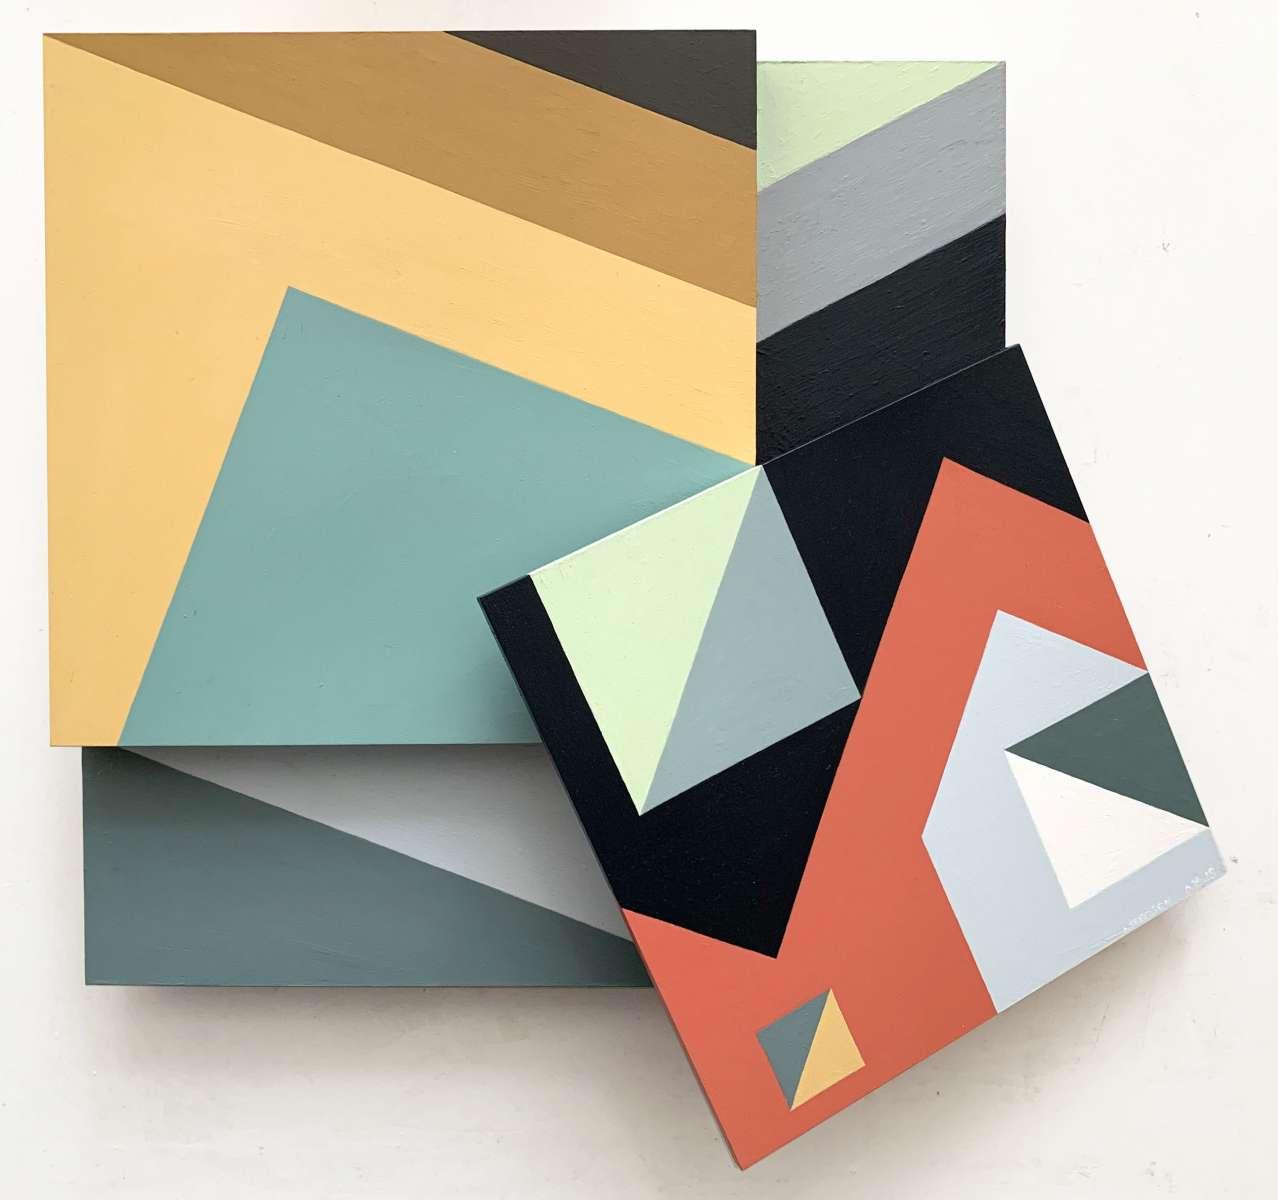 SCOPE Art Show | The New Contemporary